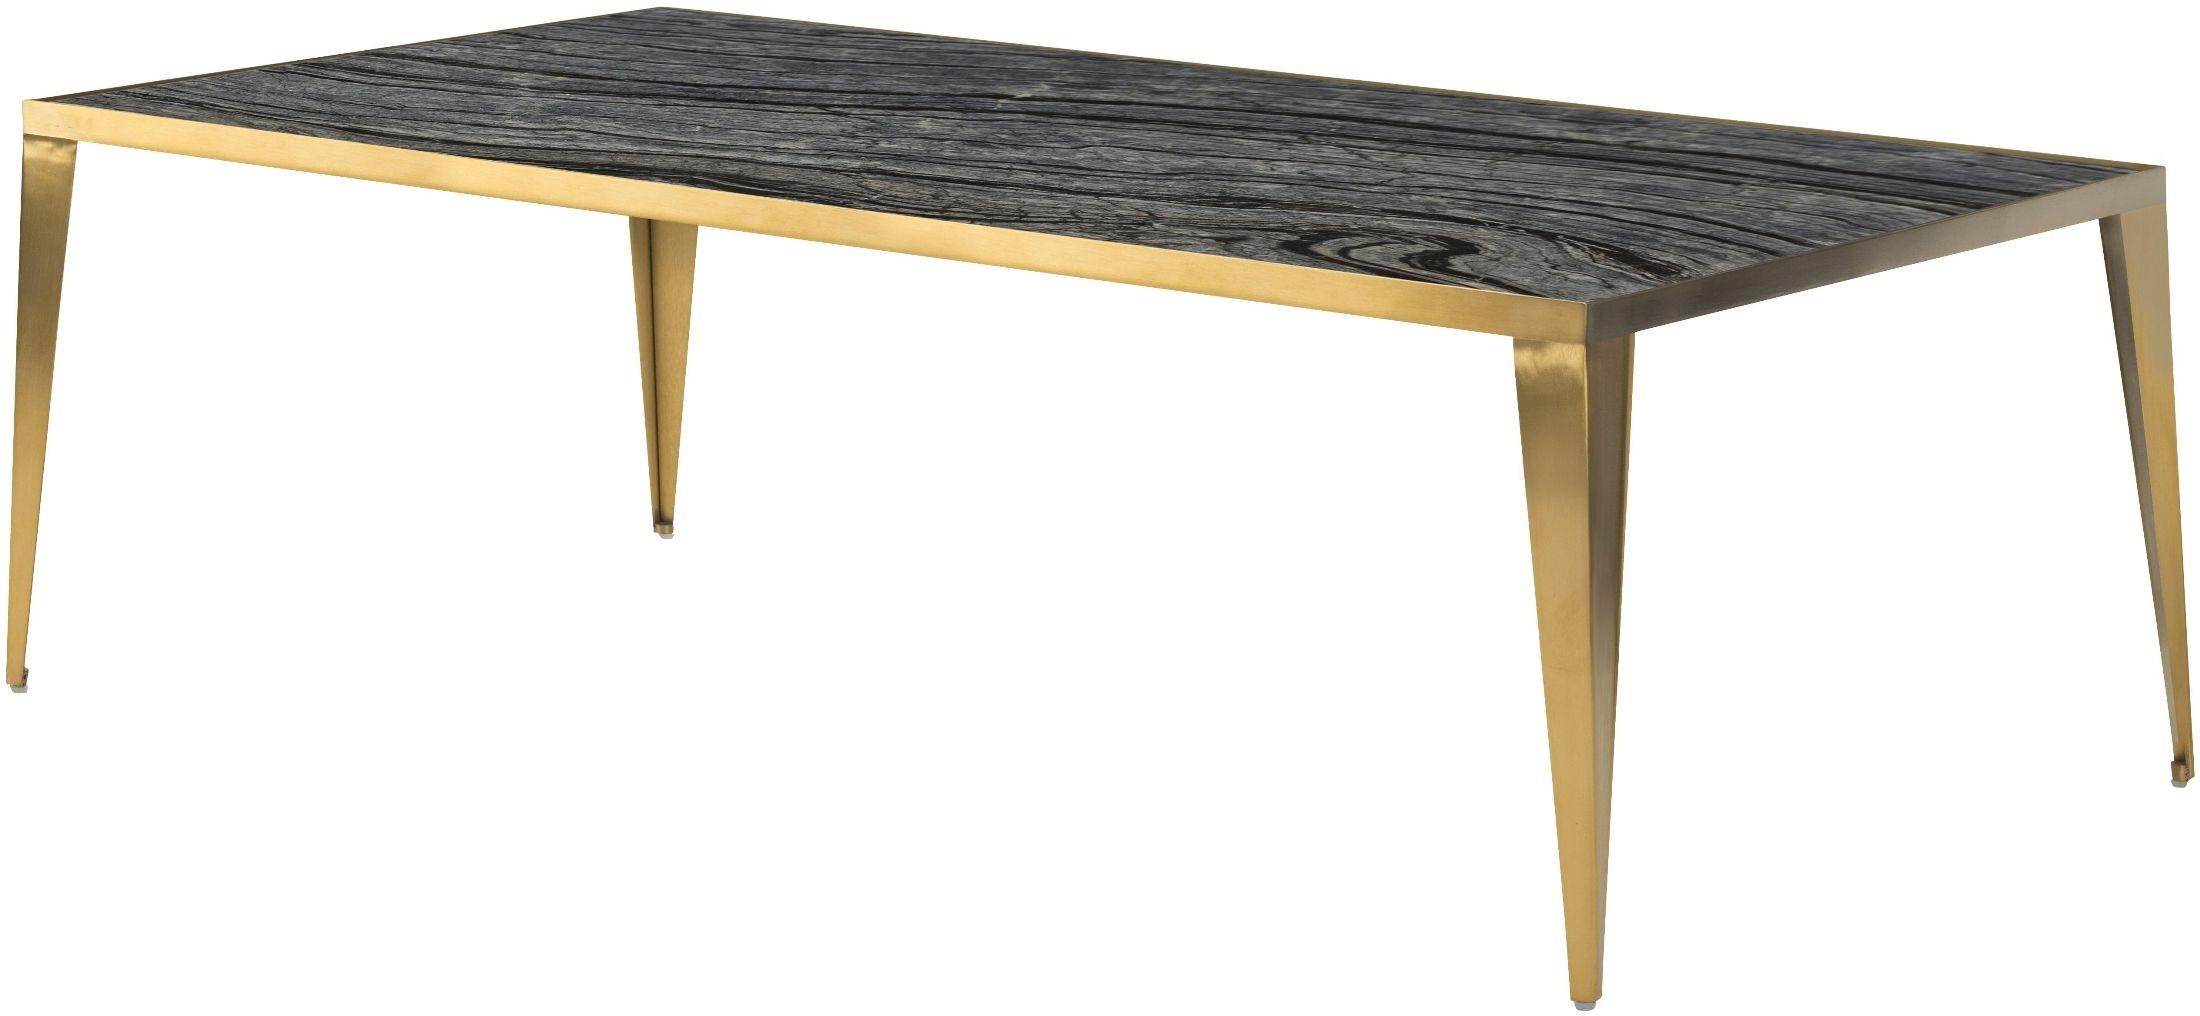 Mink Black Stone Coffee Table Hgna141 Nuevo